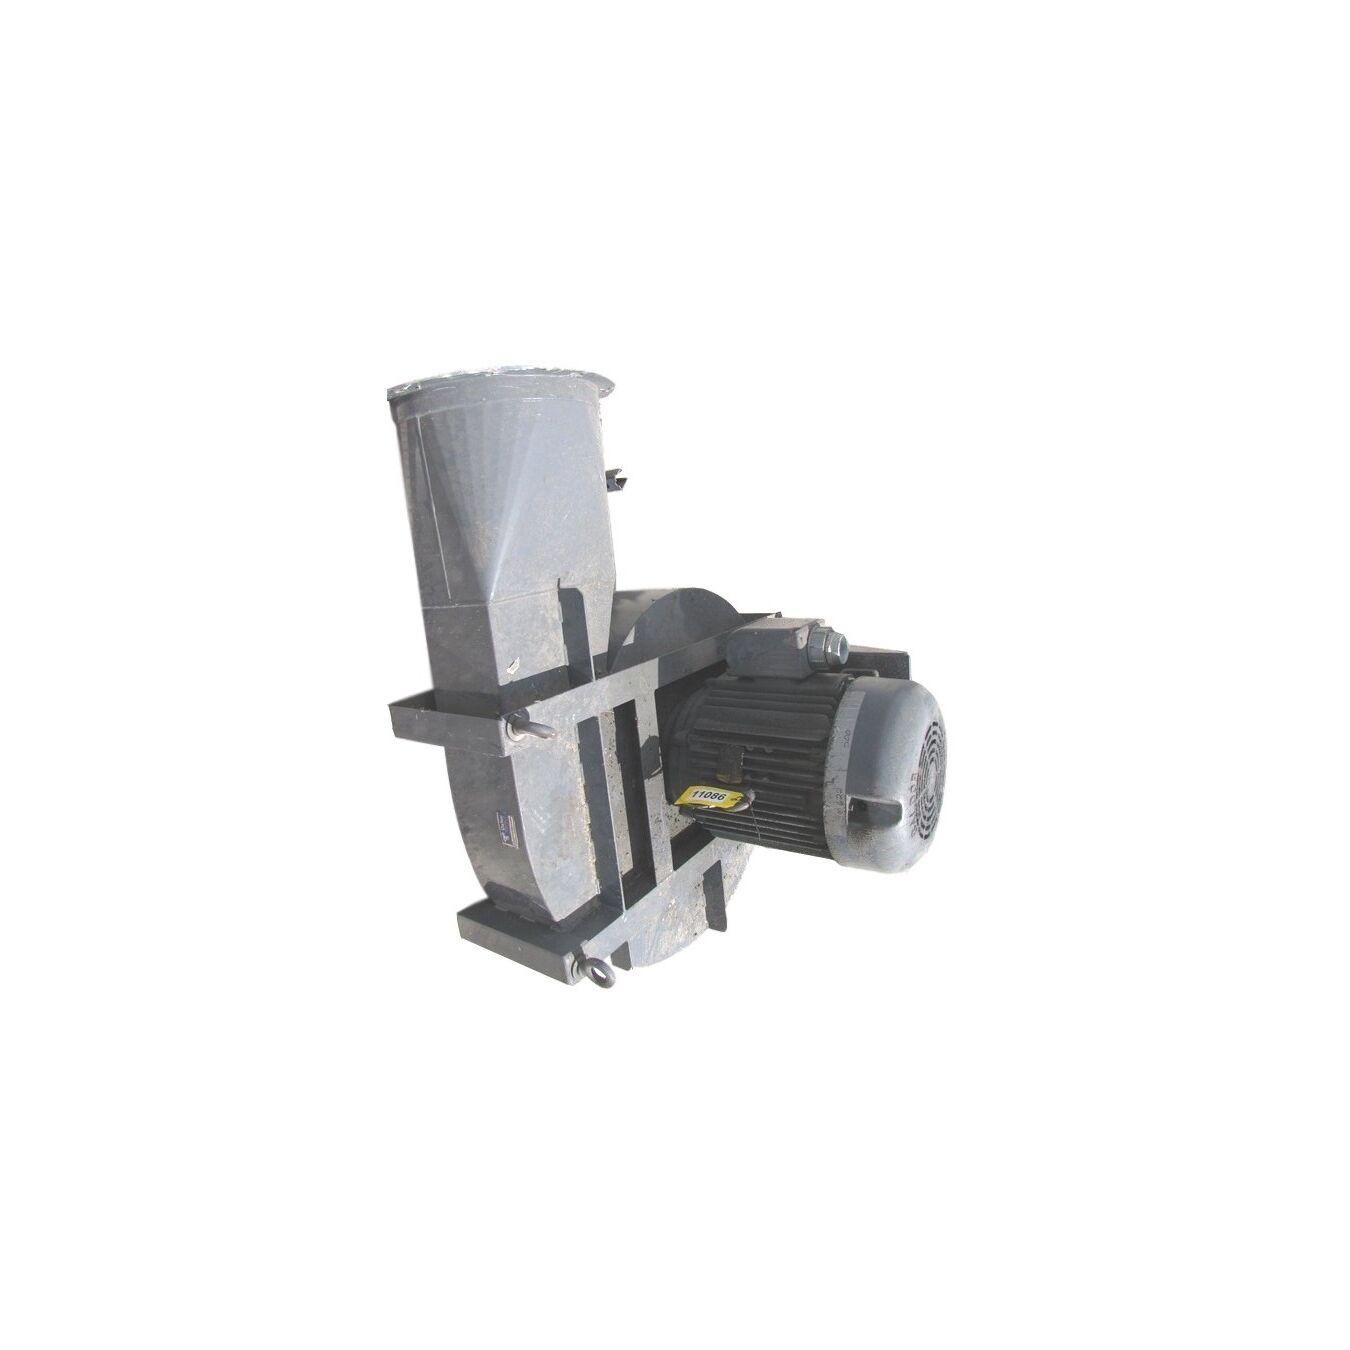 Pressure Blowers And Fans : Cfm quot sp used daltec pressure blower model